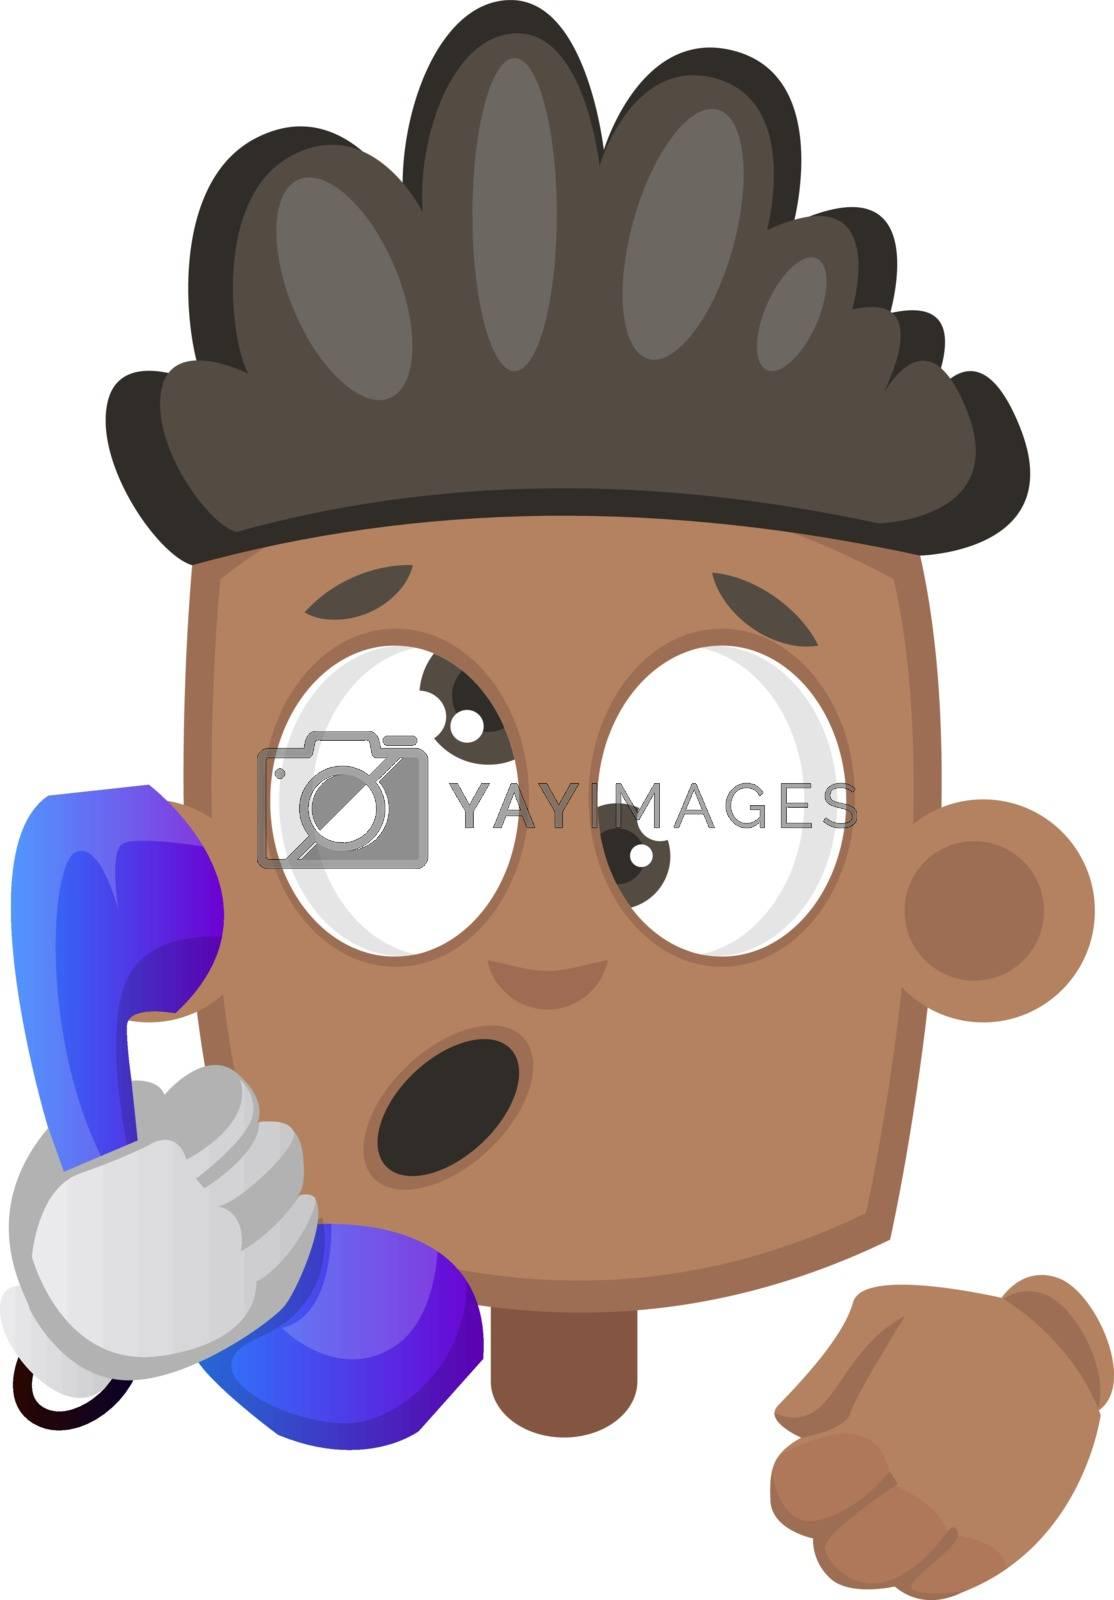 Boy speaking on telephone, illustration, vector on white background.